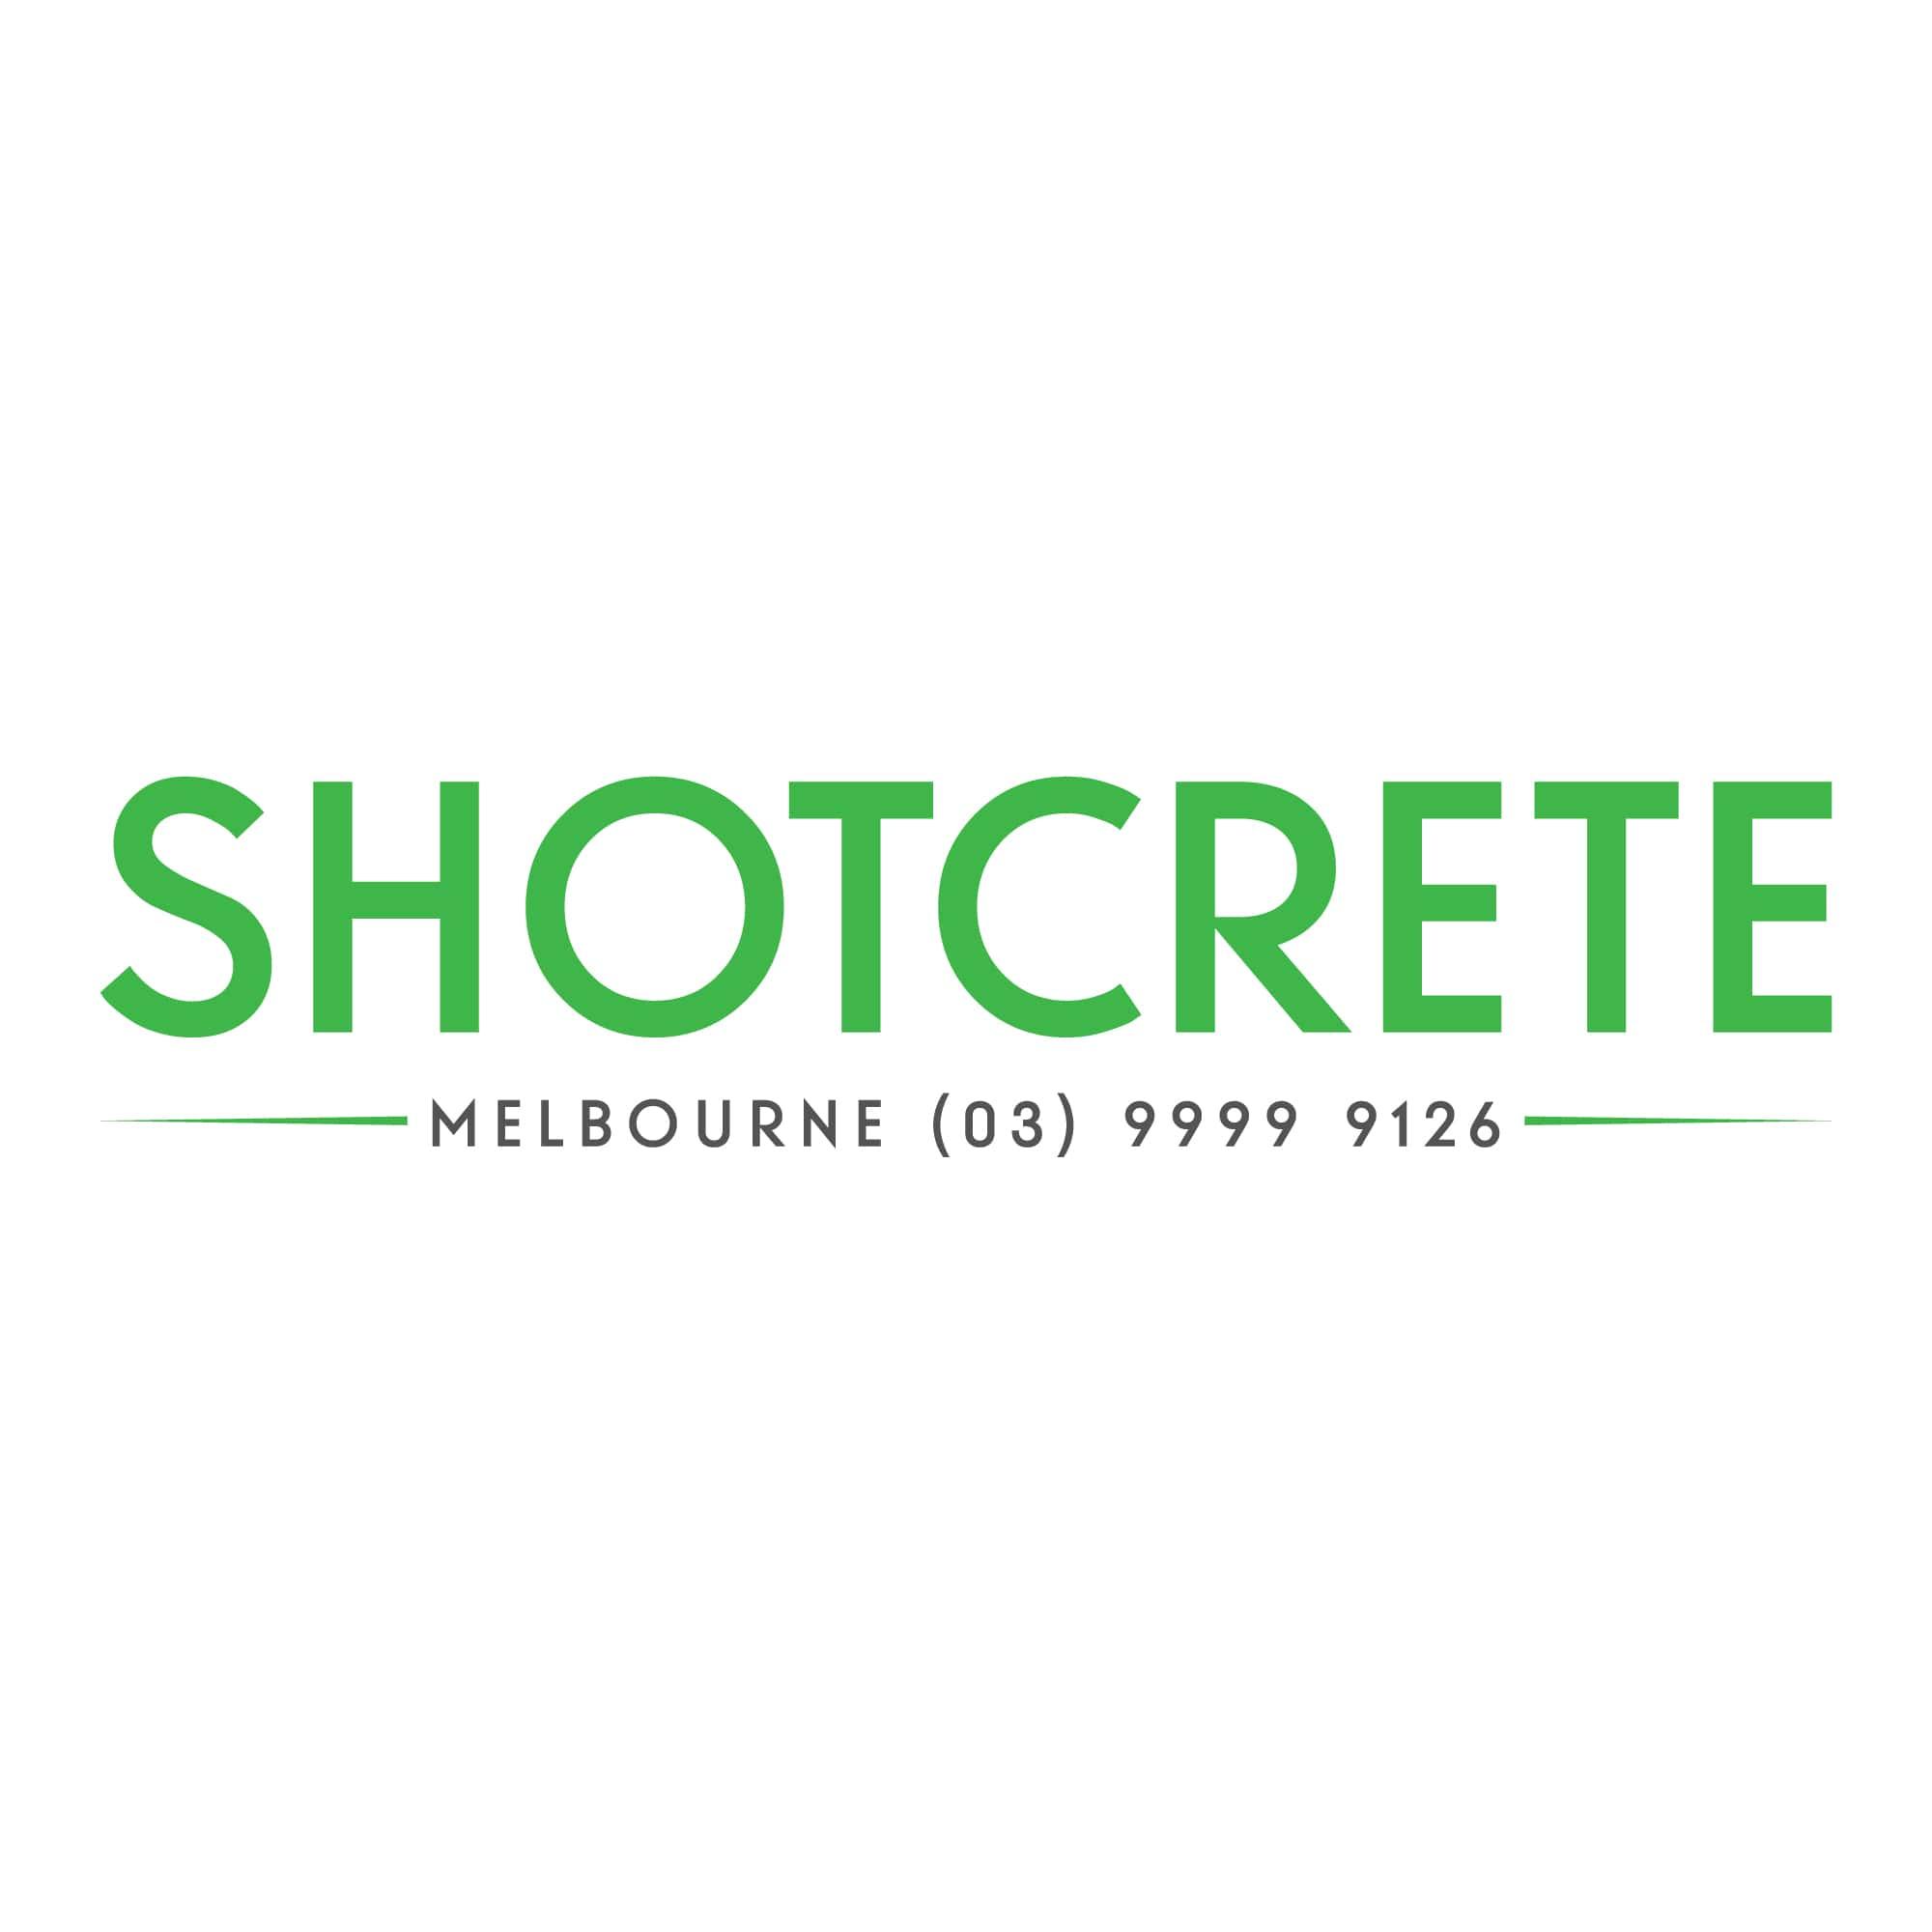 shotcrete melbourne logo